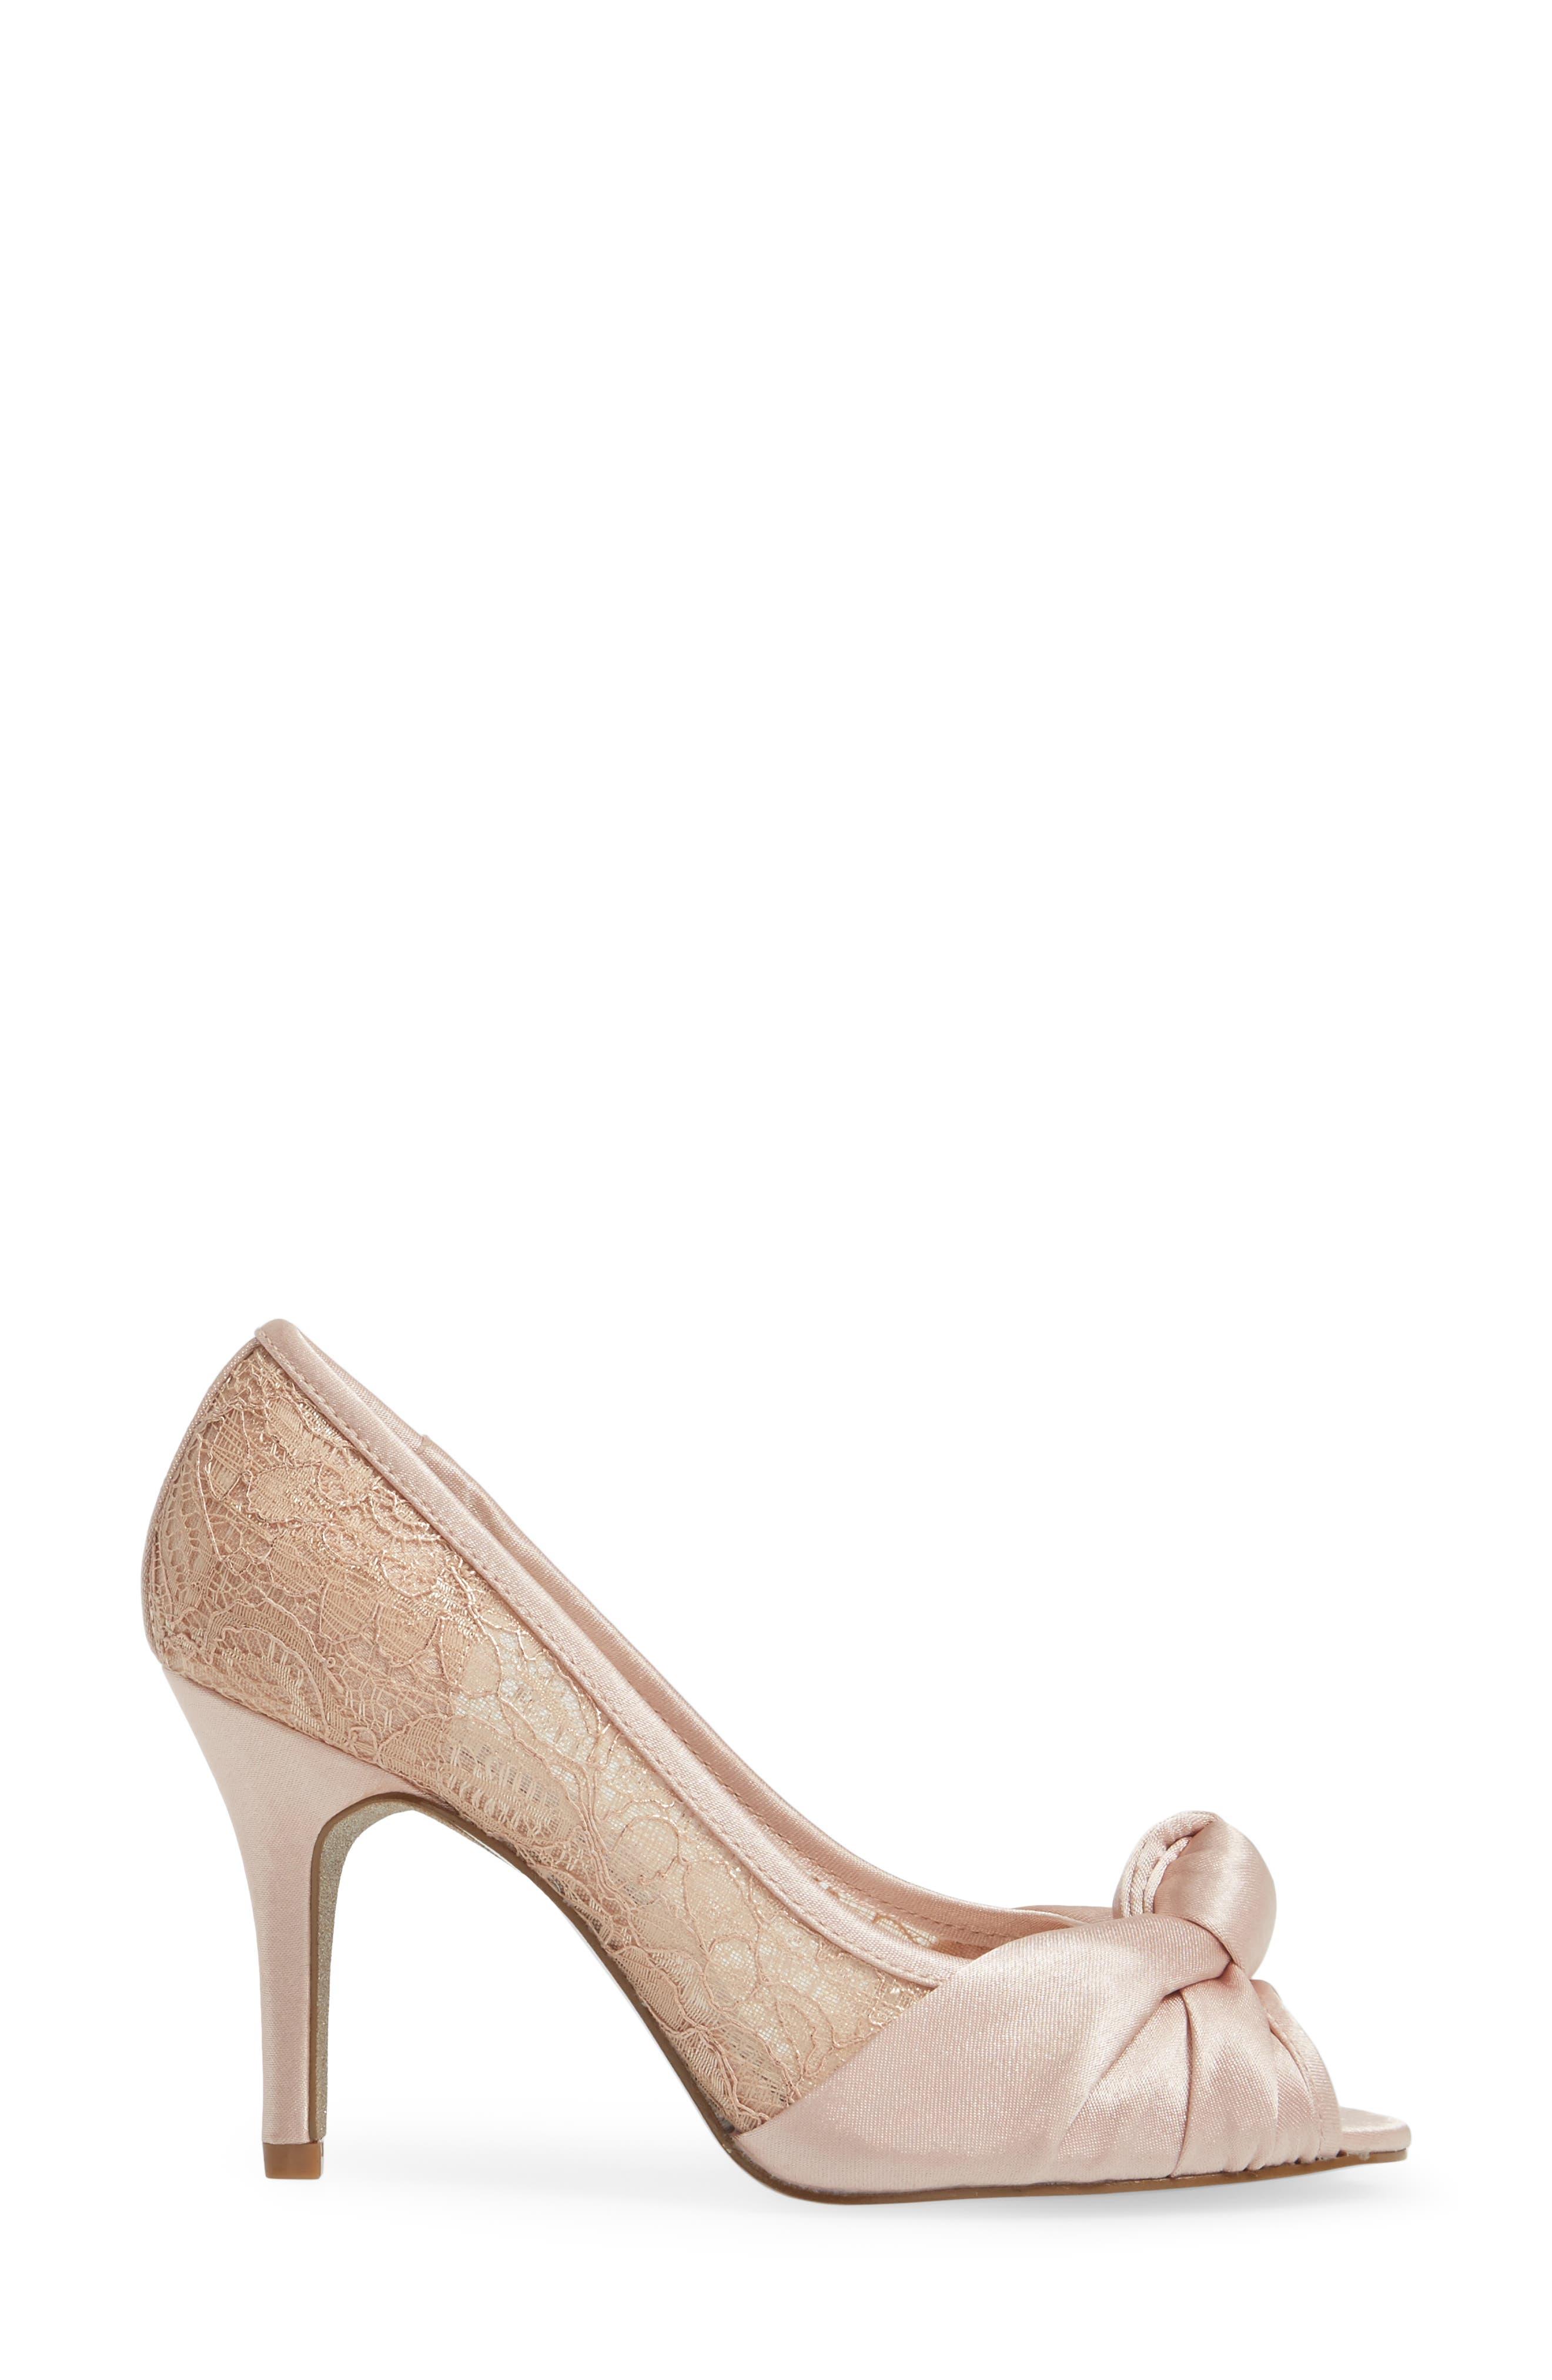 Alternate Image 3  - Adrianna Papell Francesca Knotted Peep Toe Pump (Women)